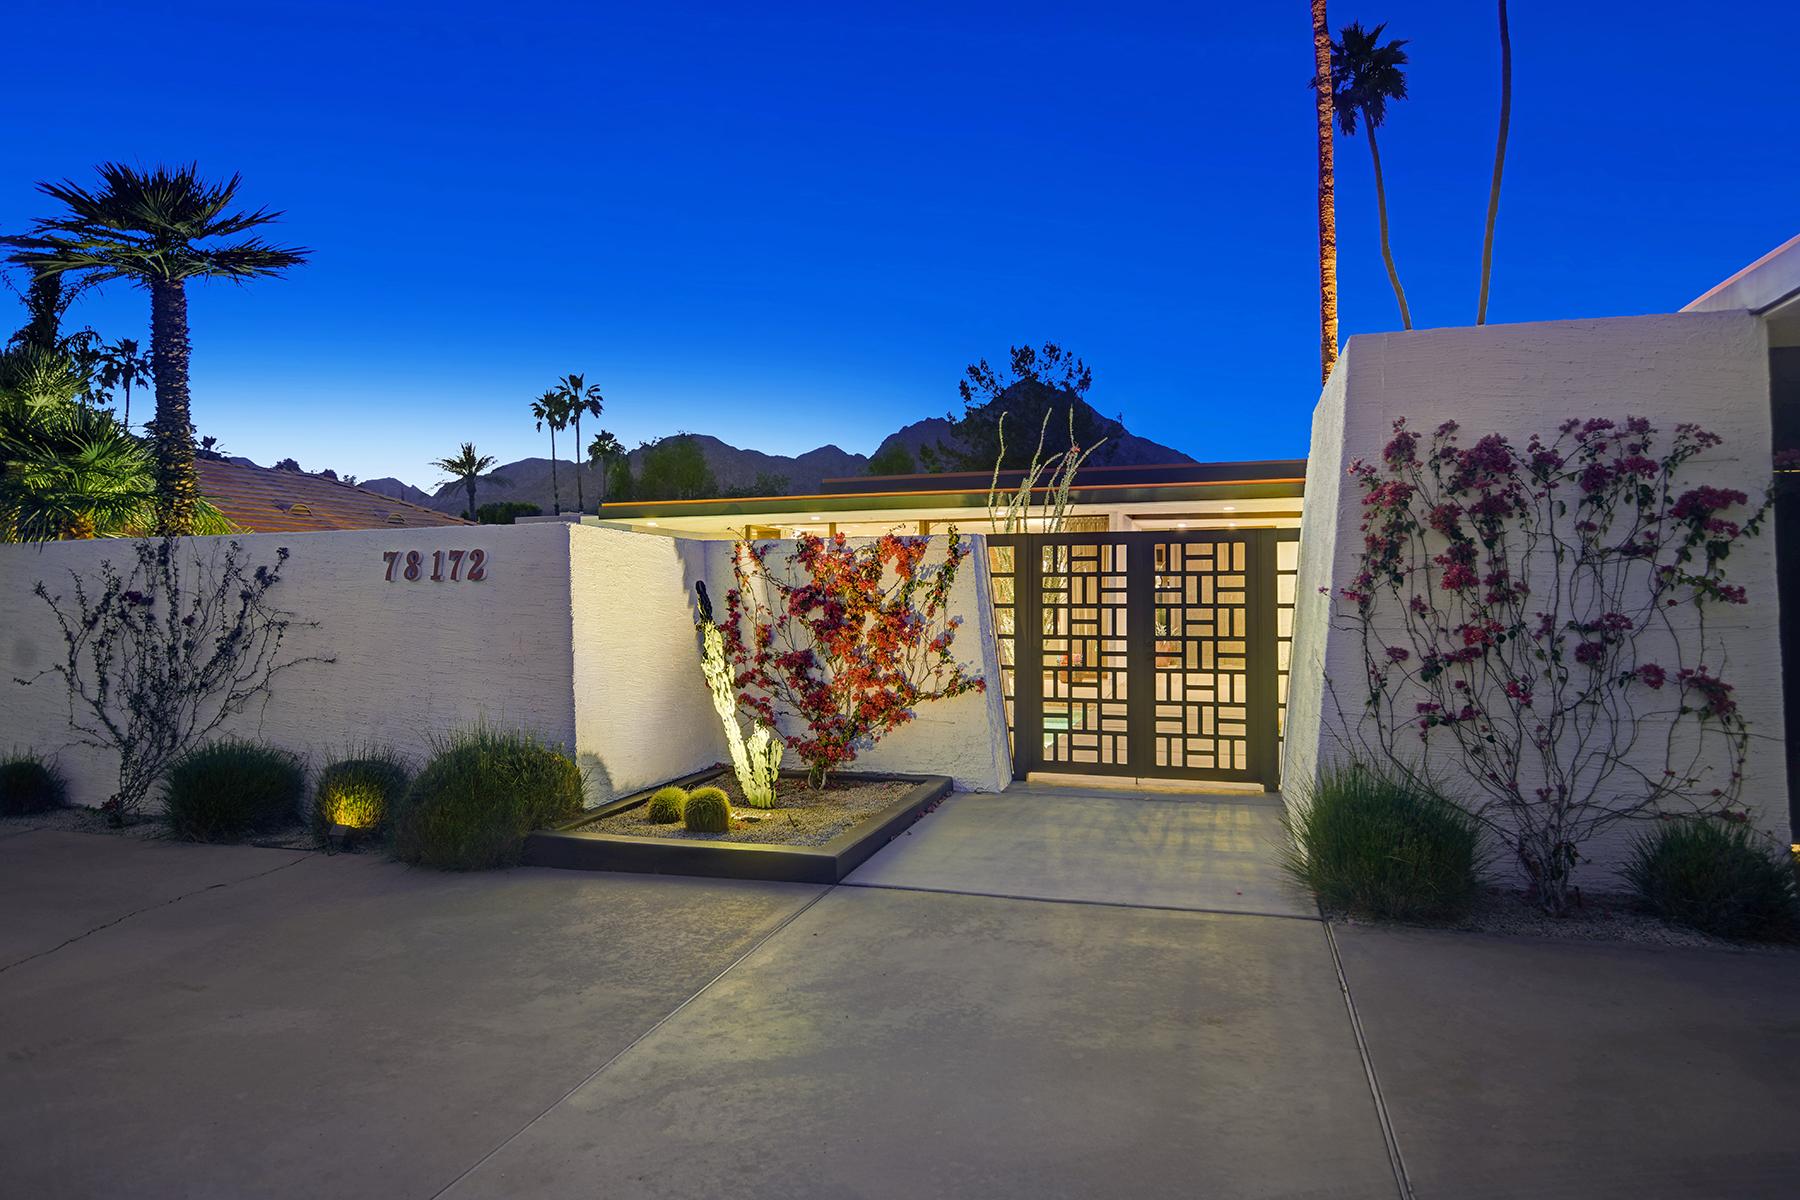 Single Family Homes for Active at 78172 San Timoteo Street La Quinta, California 92253 United States